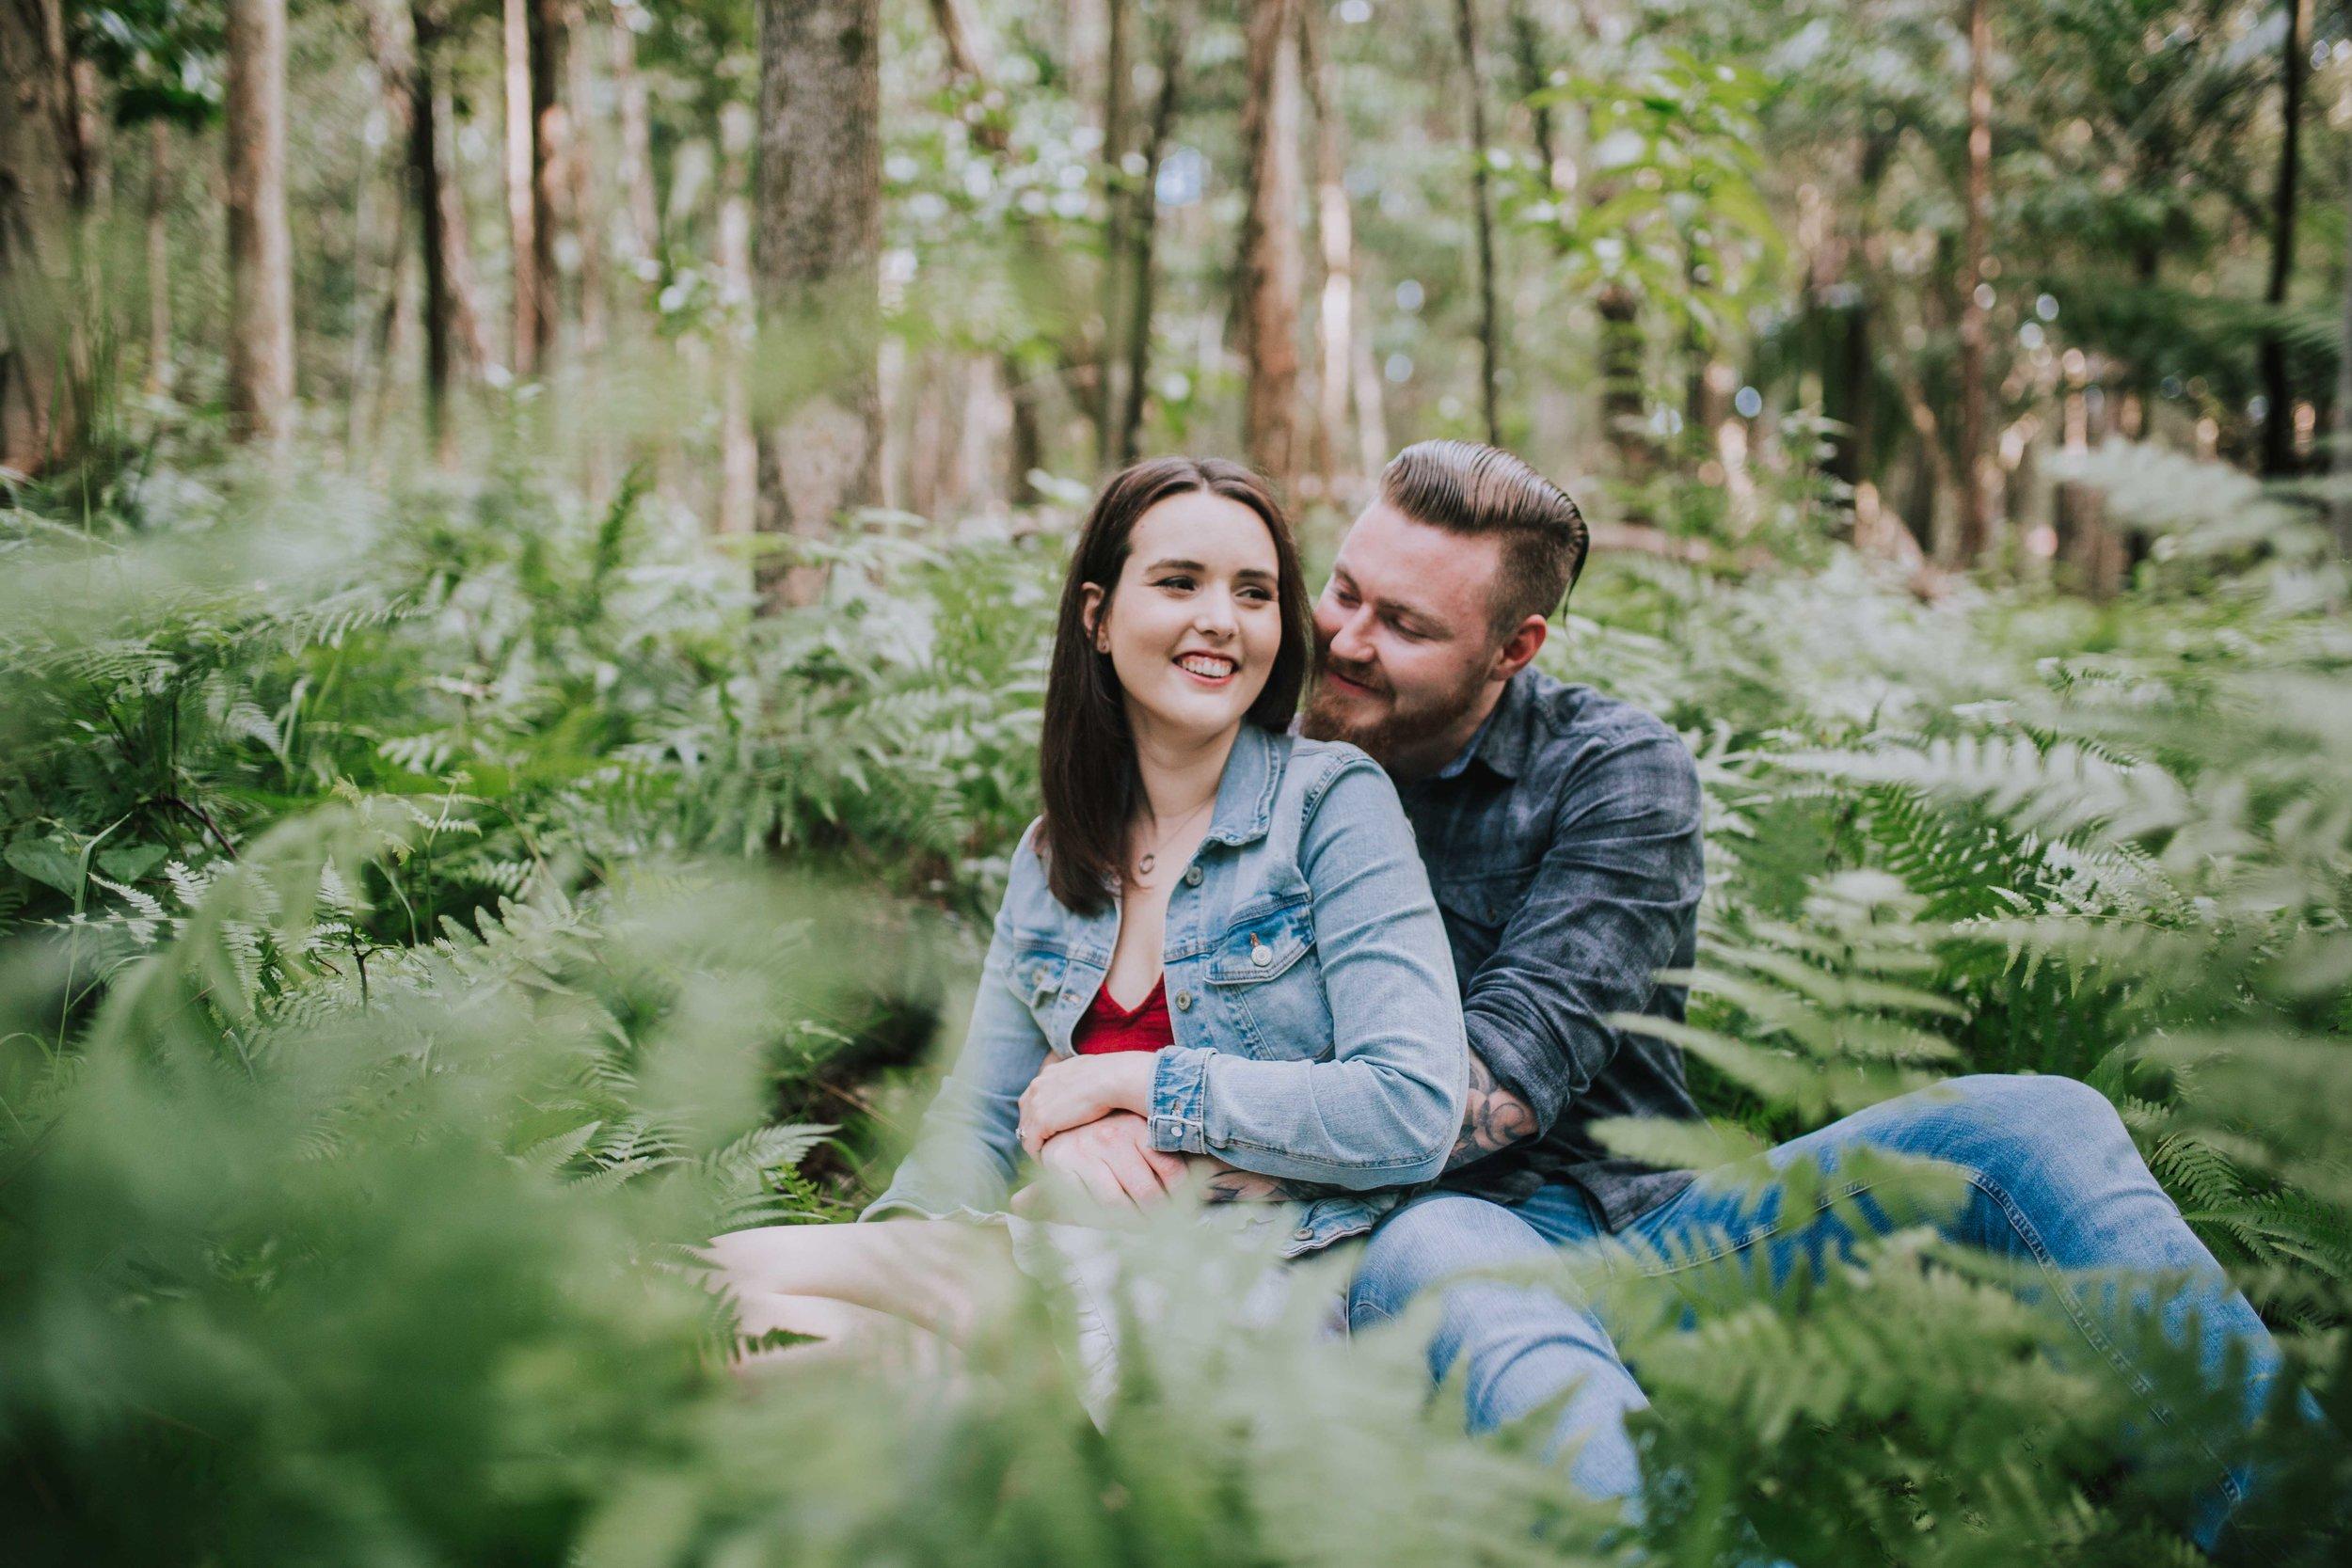 Brisbane Wedding Photographer.Engagements (18 of 22).jpg